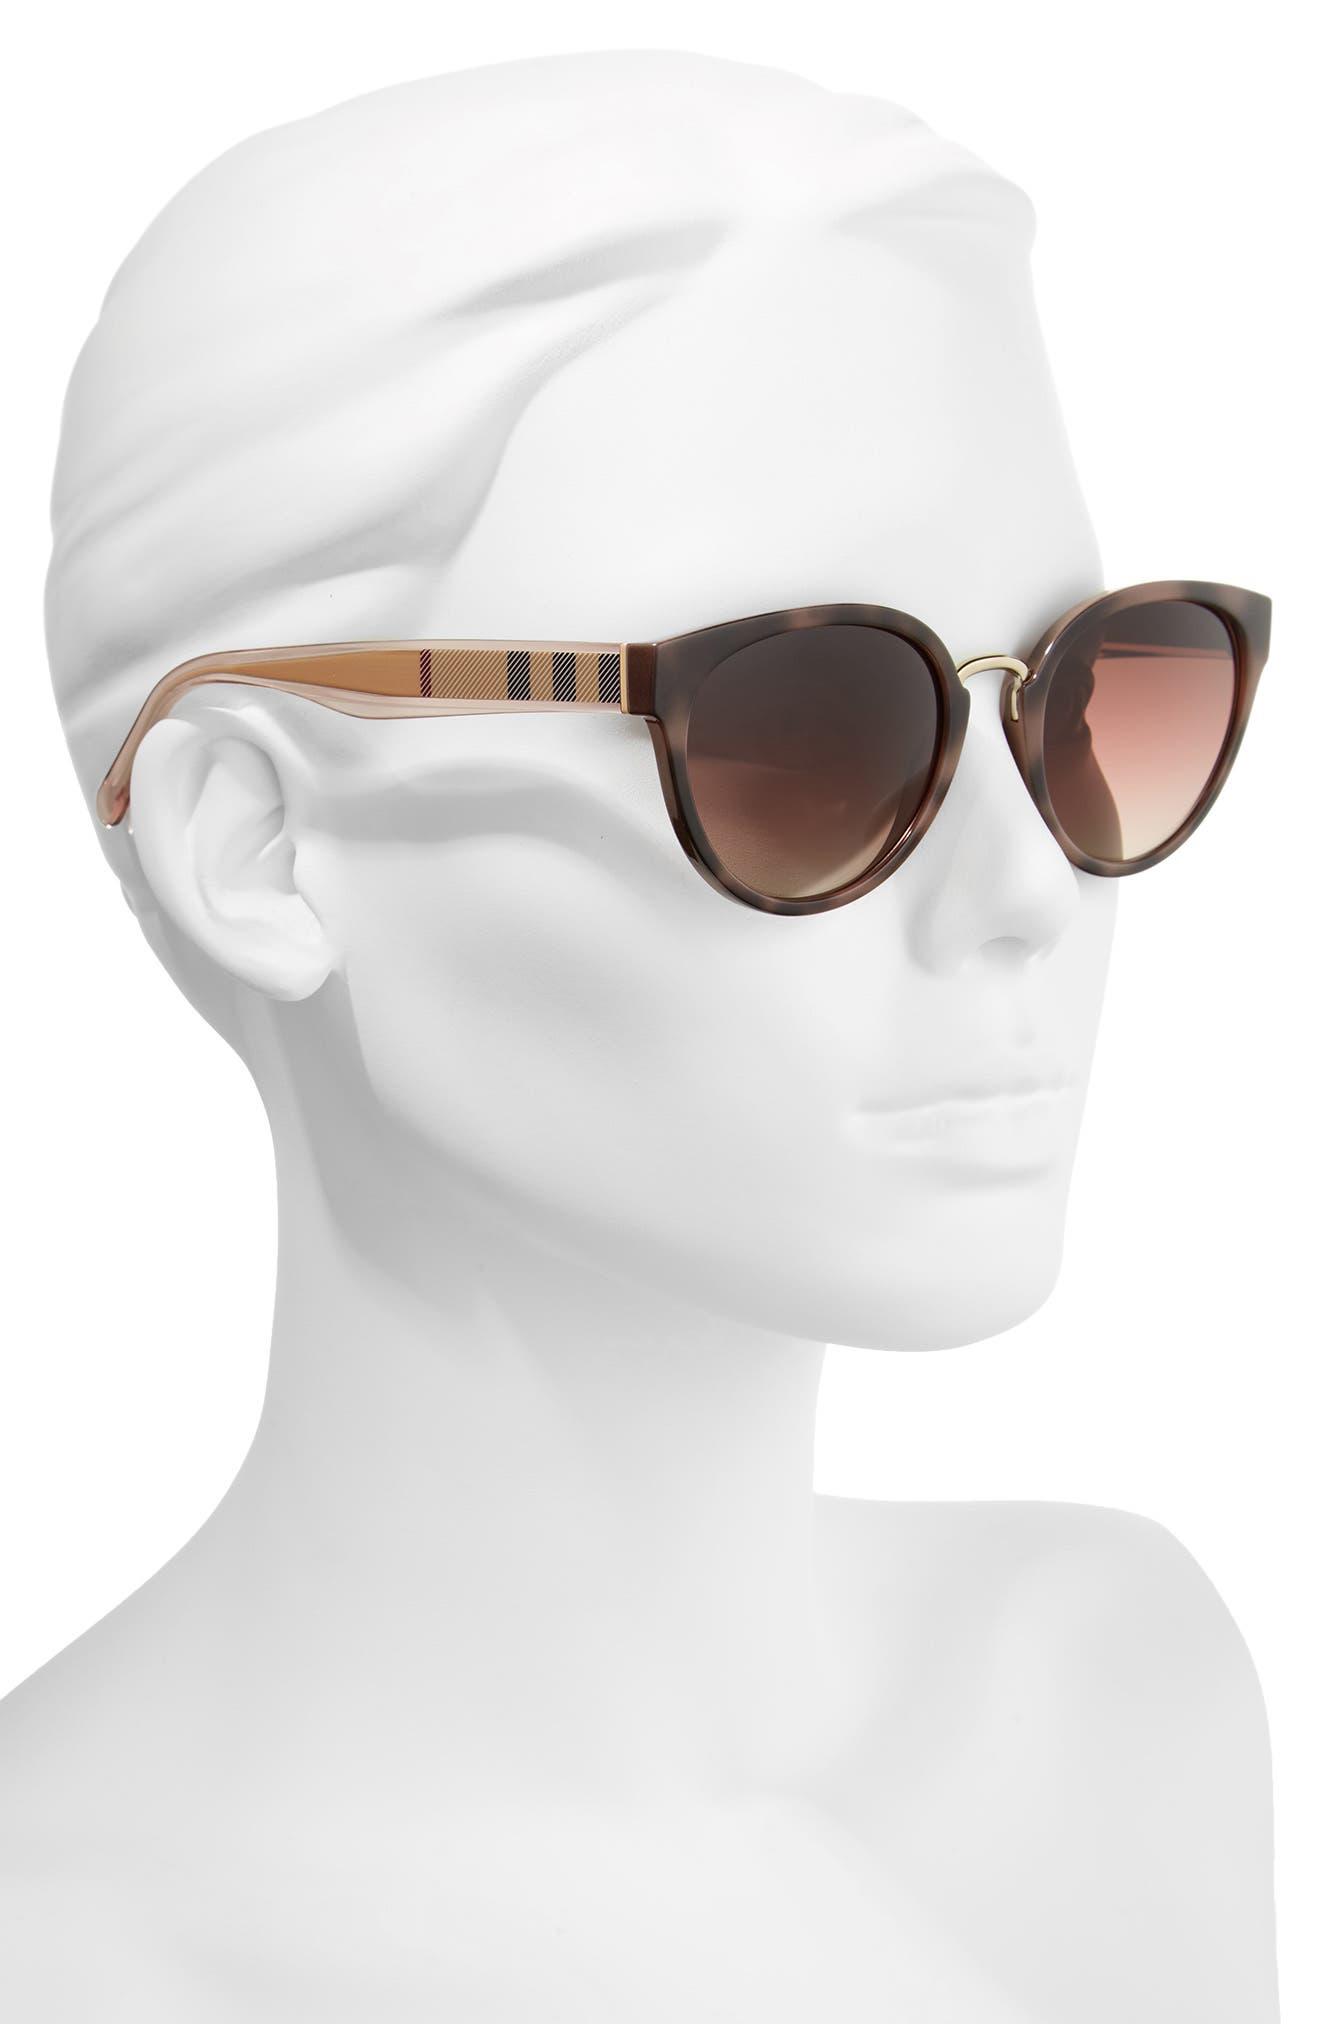 53mm Gradient Cat Eye Sunglasses,                             Alternate thumbnail 7, color,